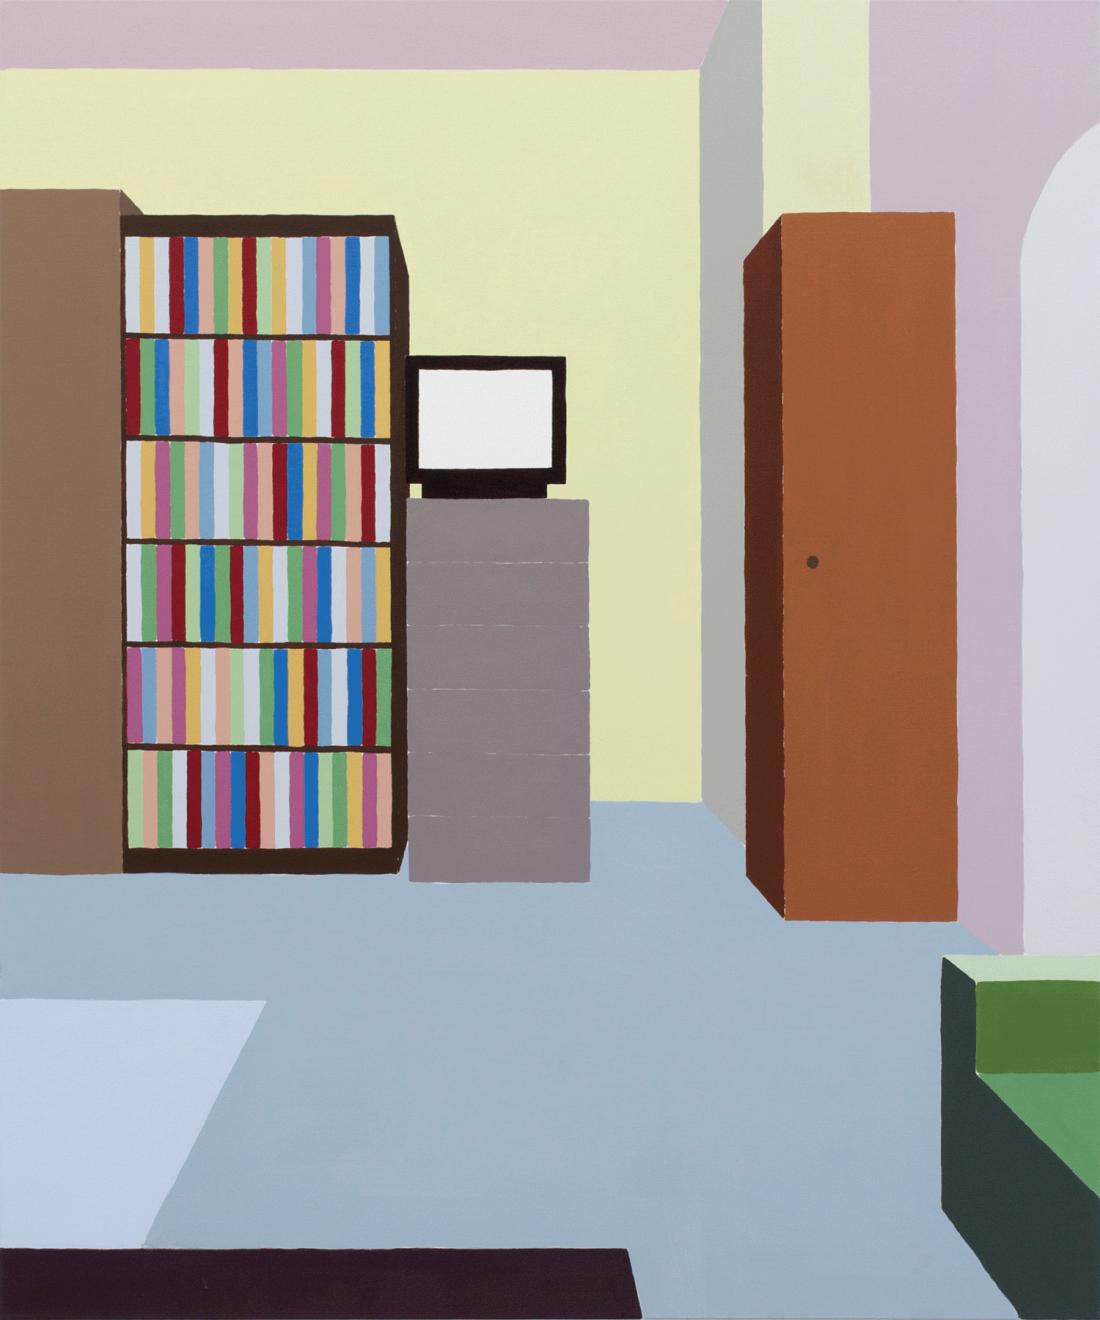 Zsofia Schweger Uses Art To Explore Ideas Of Identity And